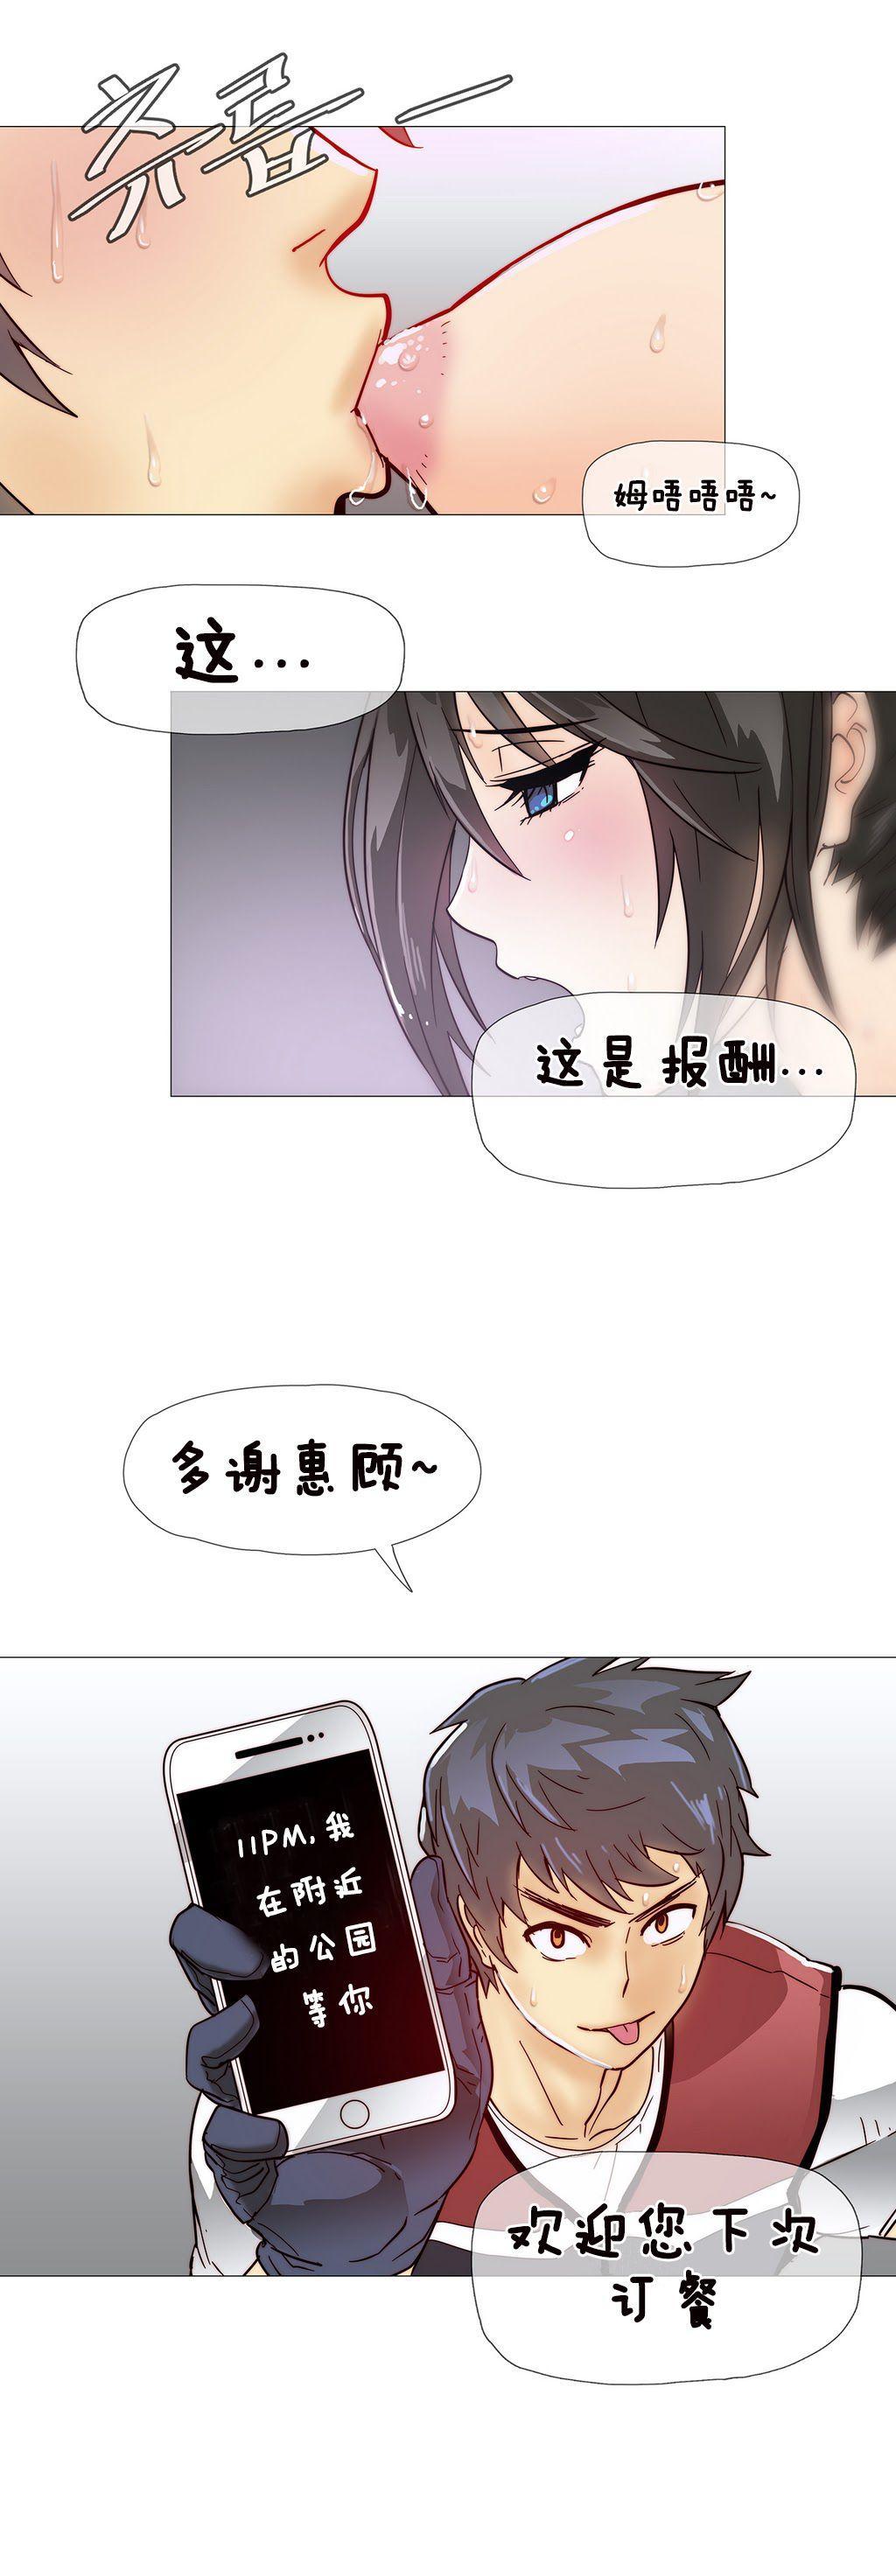 HouseHold Affairs 【卞赤鲤个人汉化】1~33话(持续更新中) 159